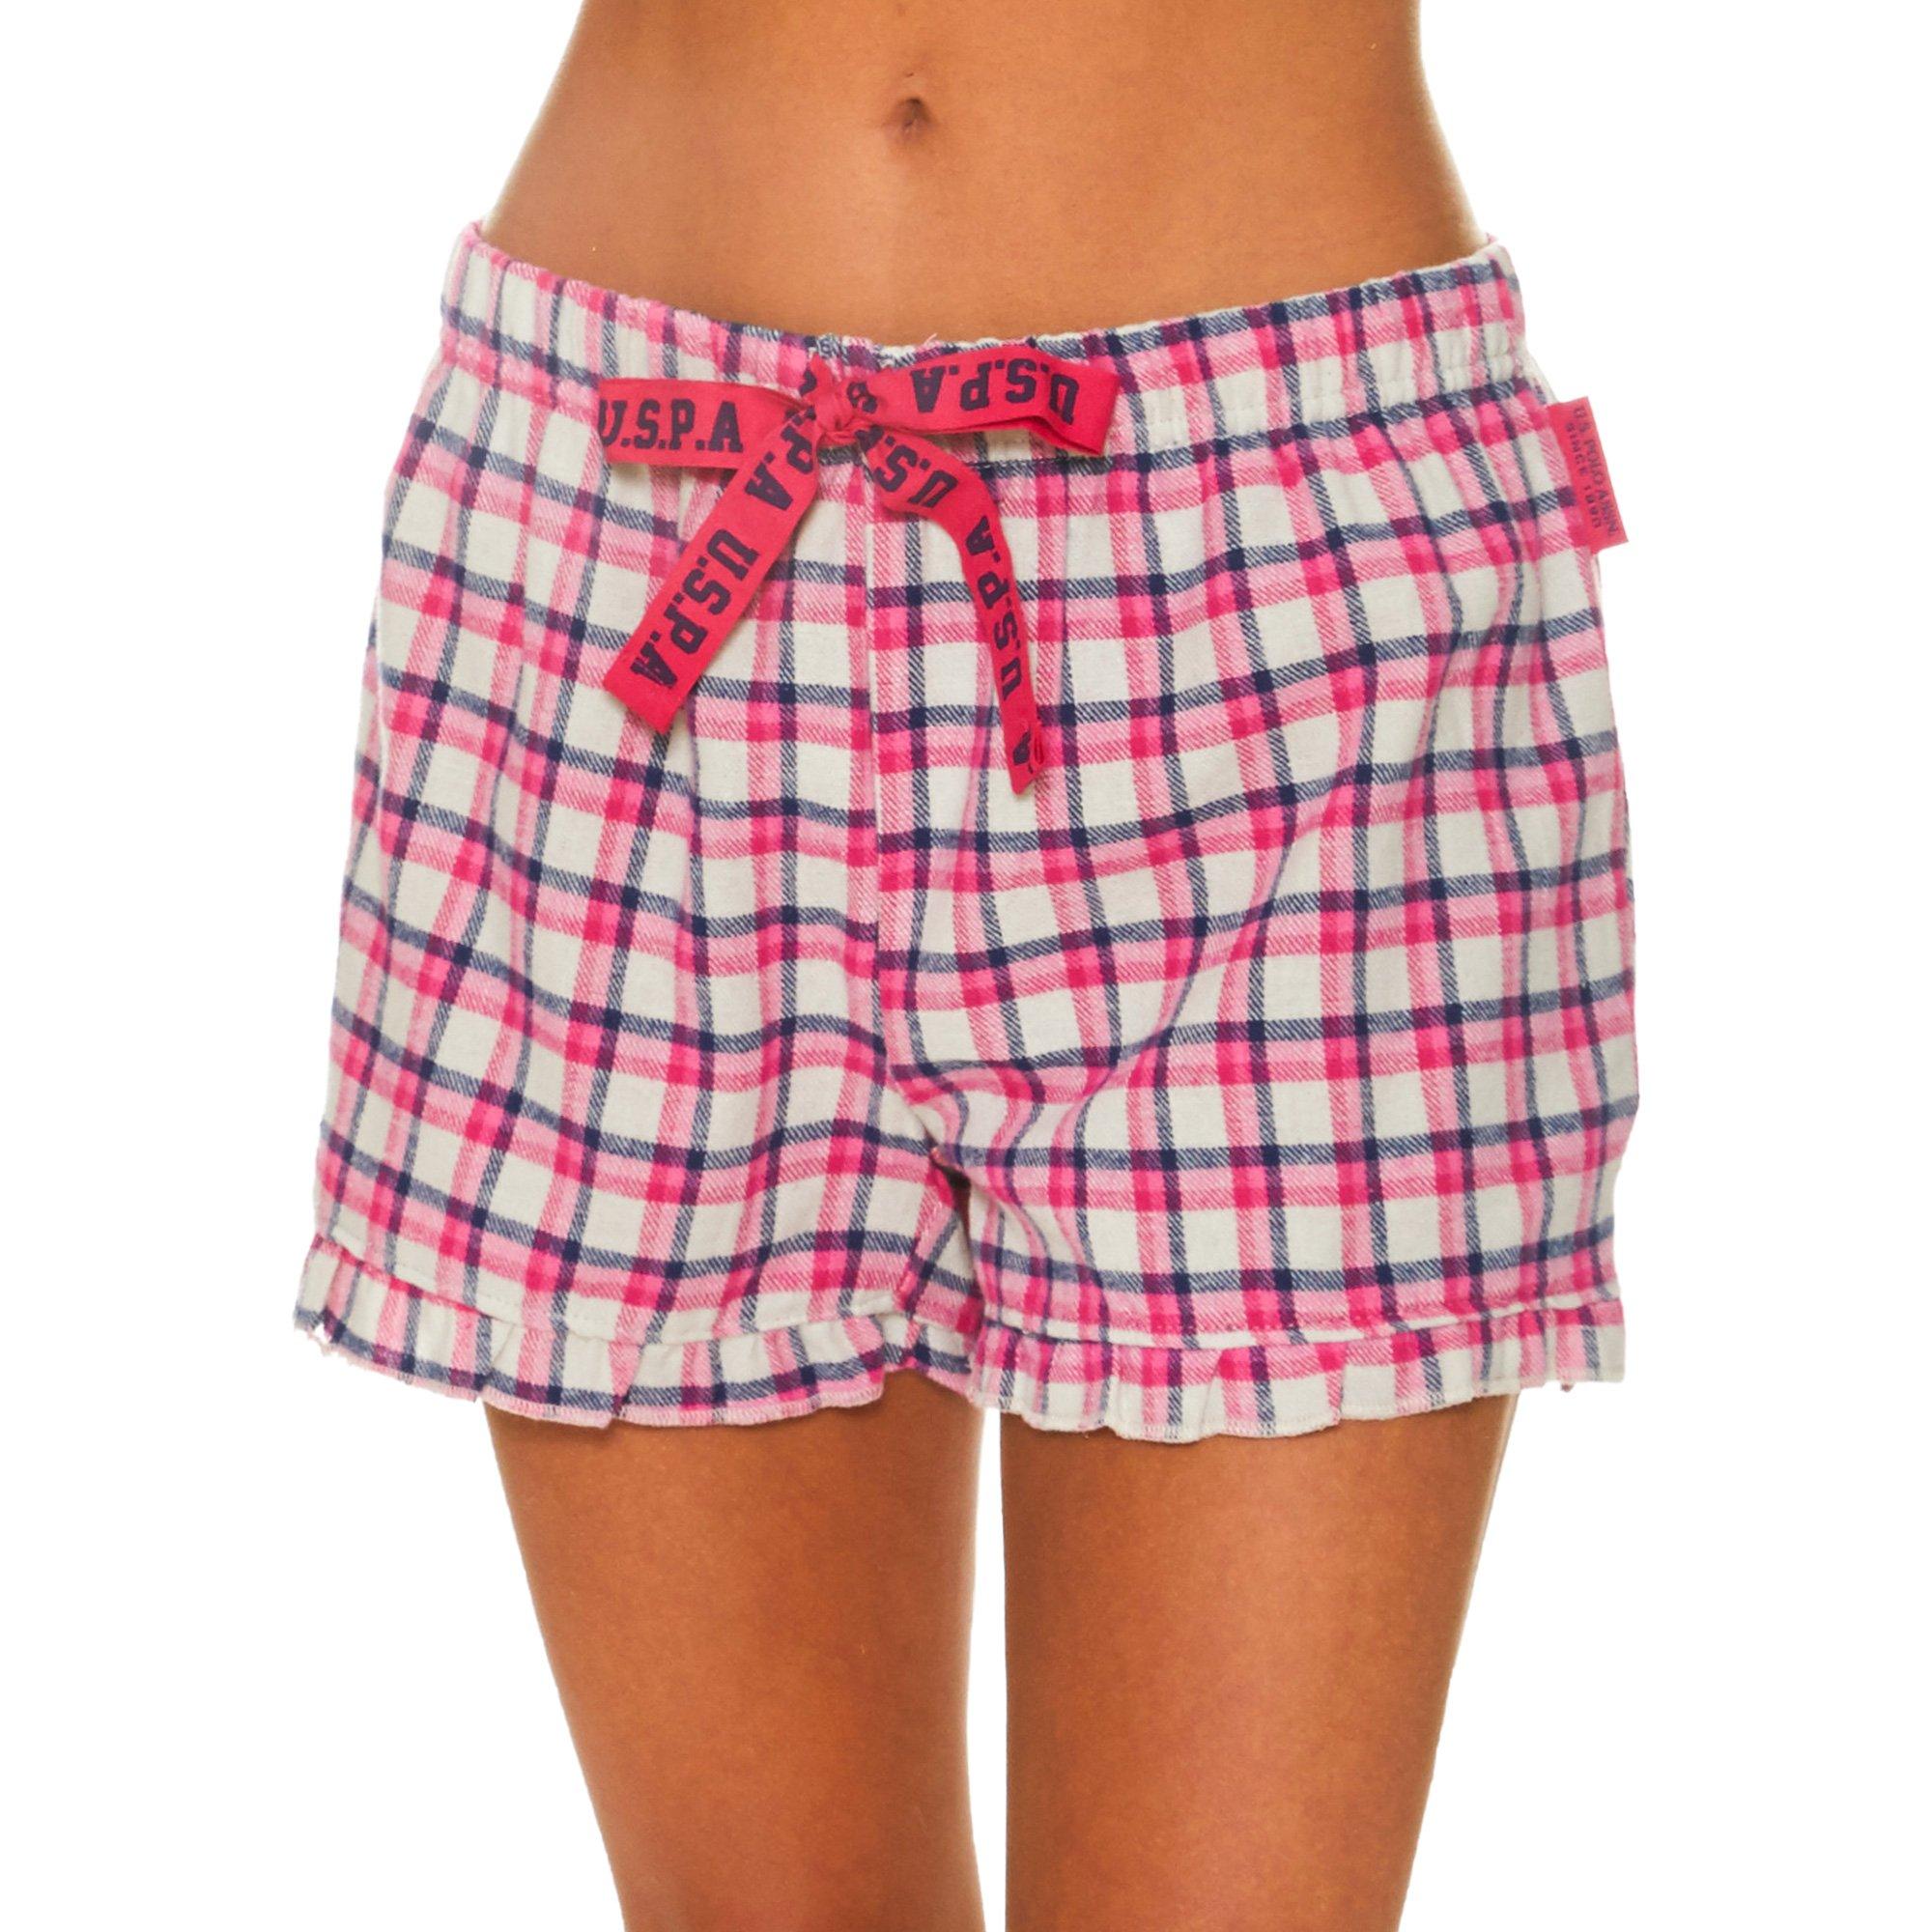 Womens Elastic Waistband Lounge//Pajama Sleep Shorts Polo Assn U.S